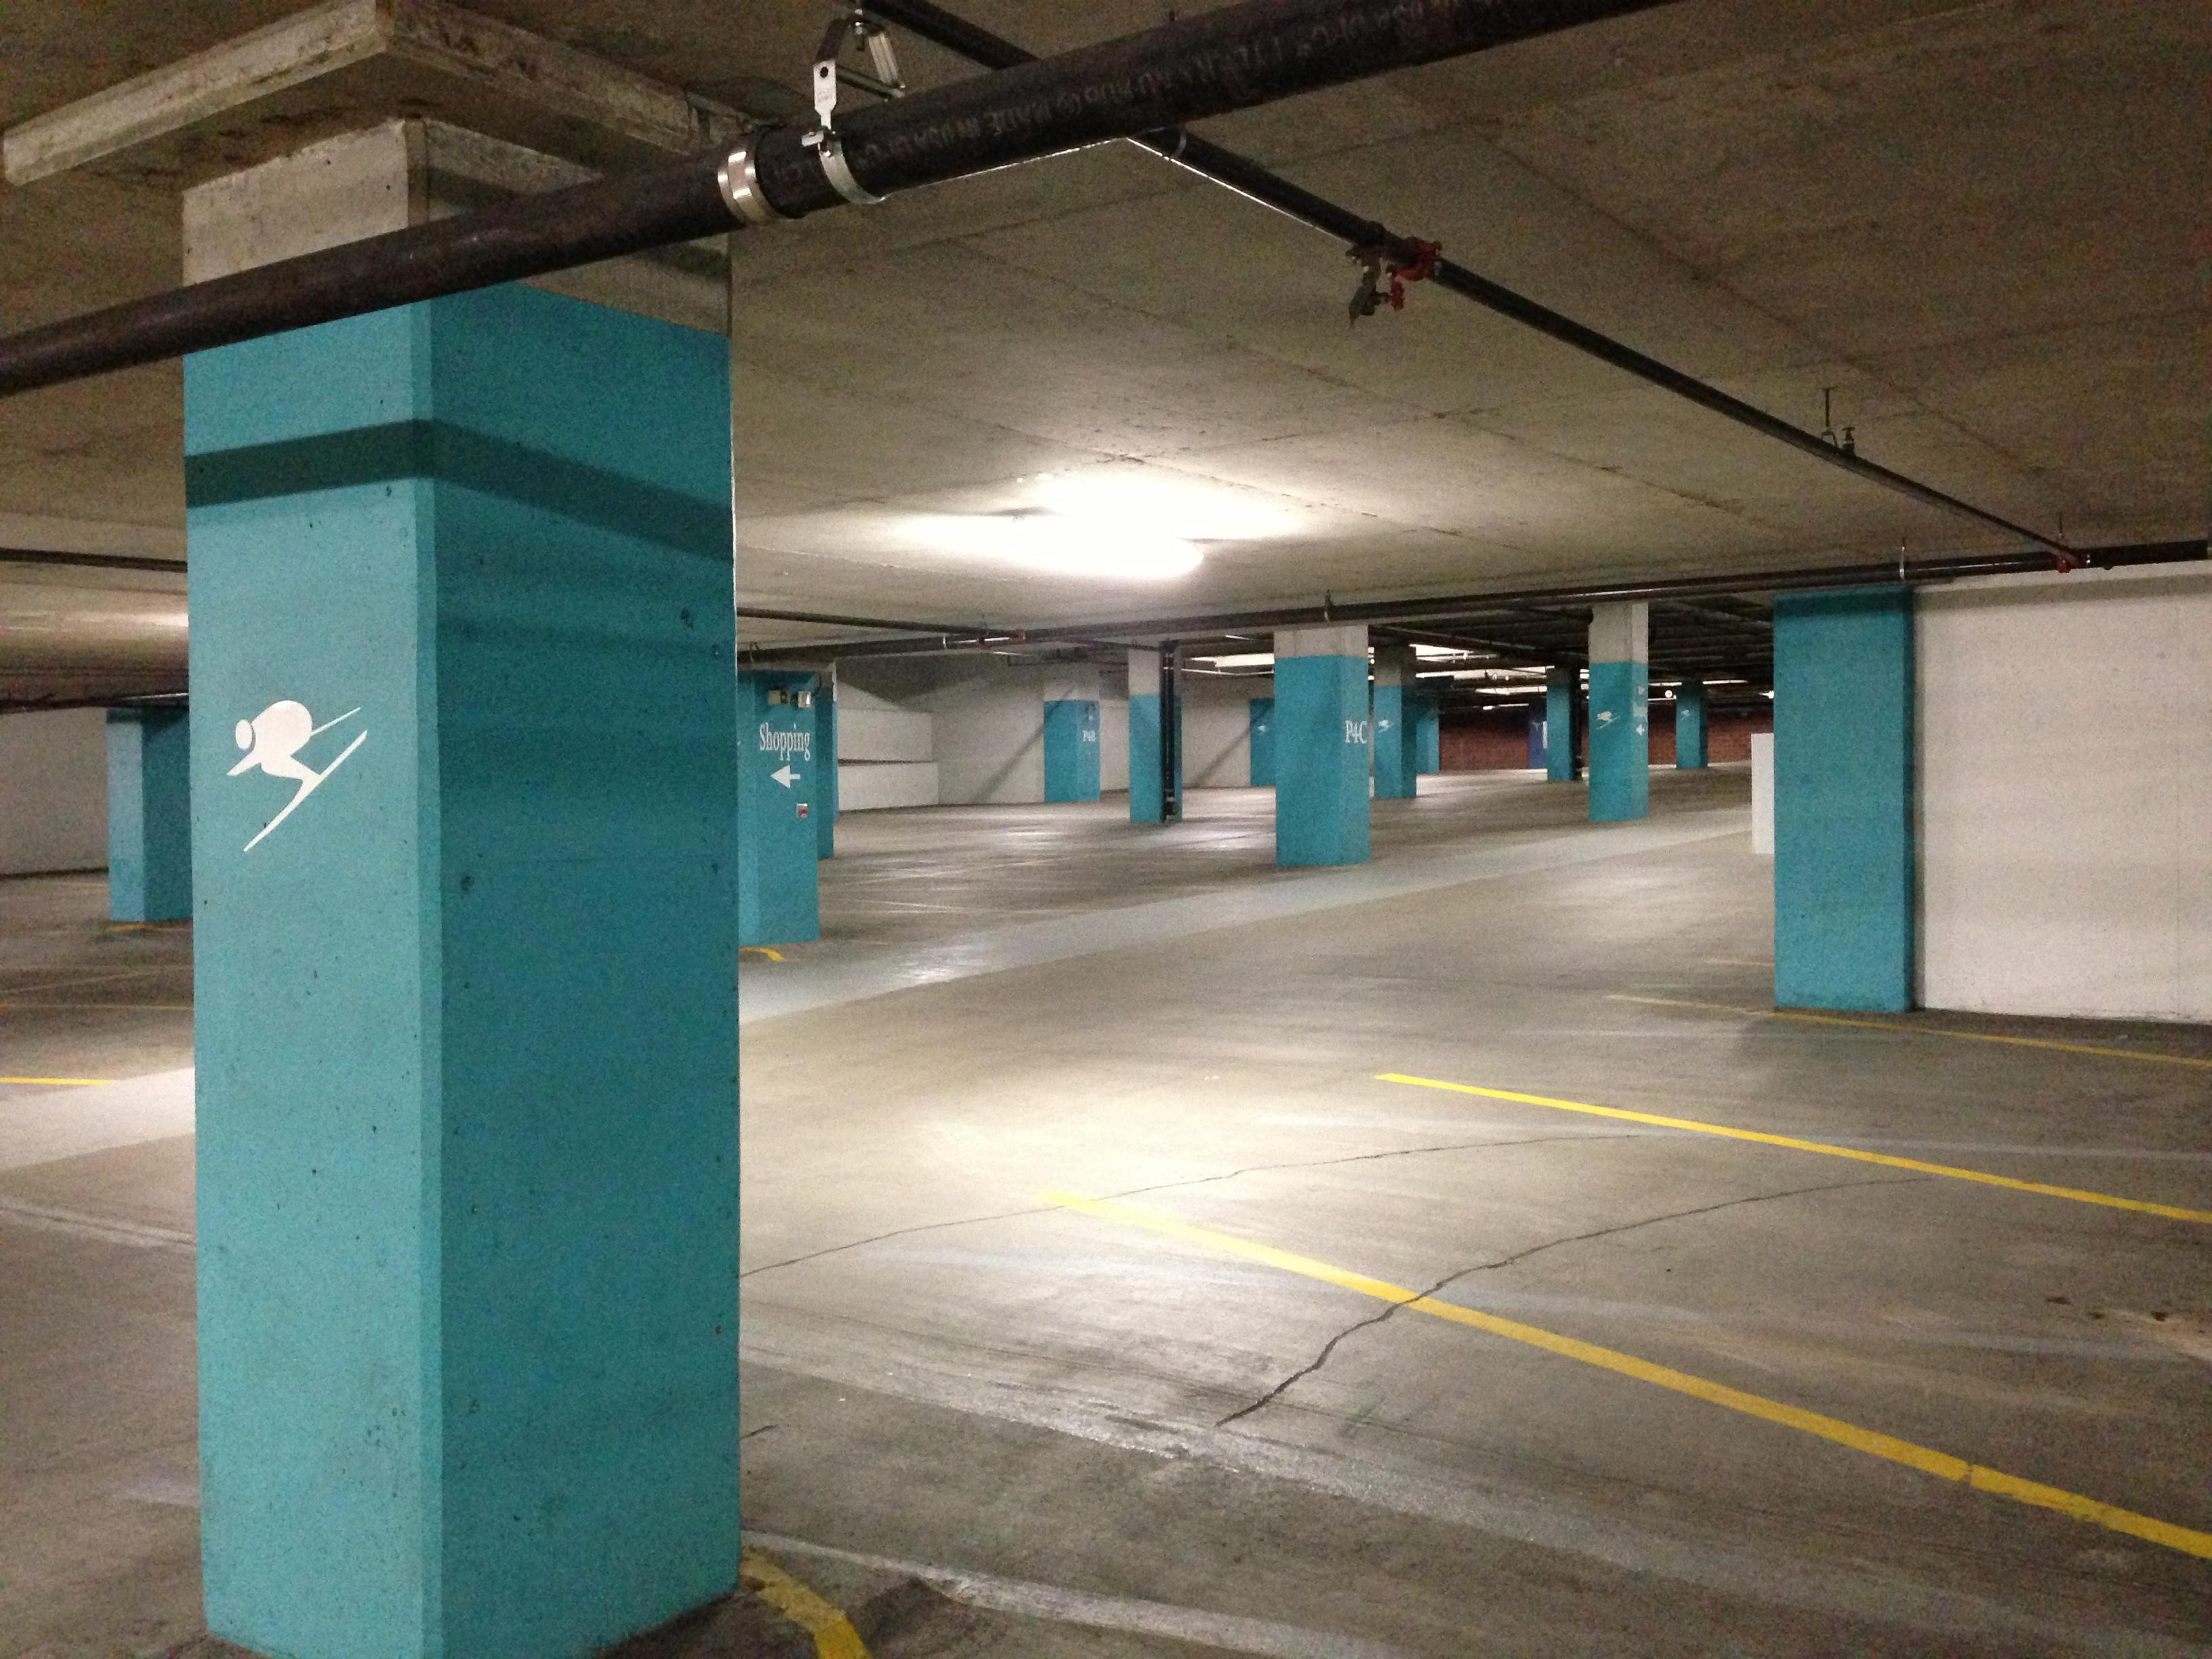 Parking garage interior design images for Garage interior designs photos